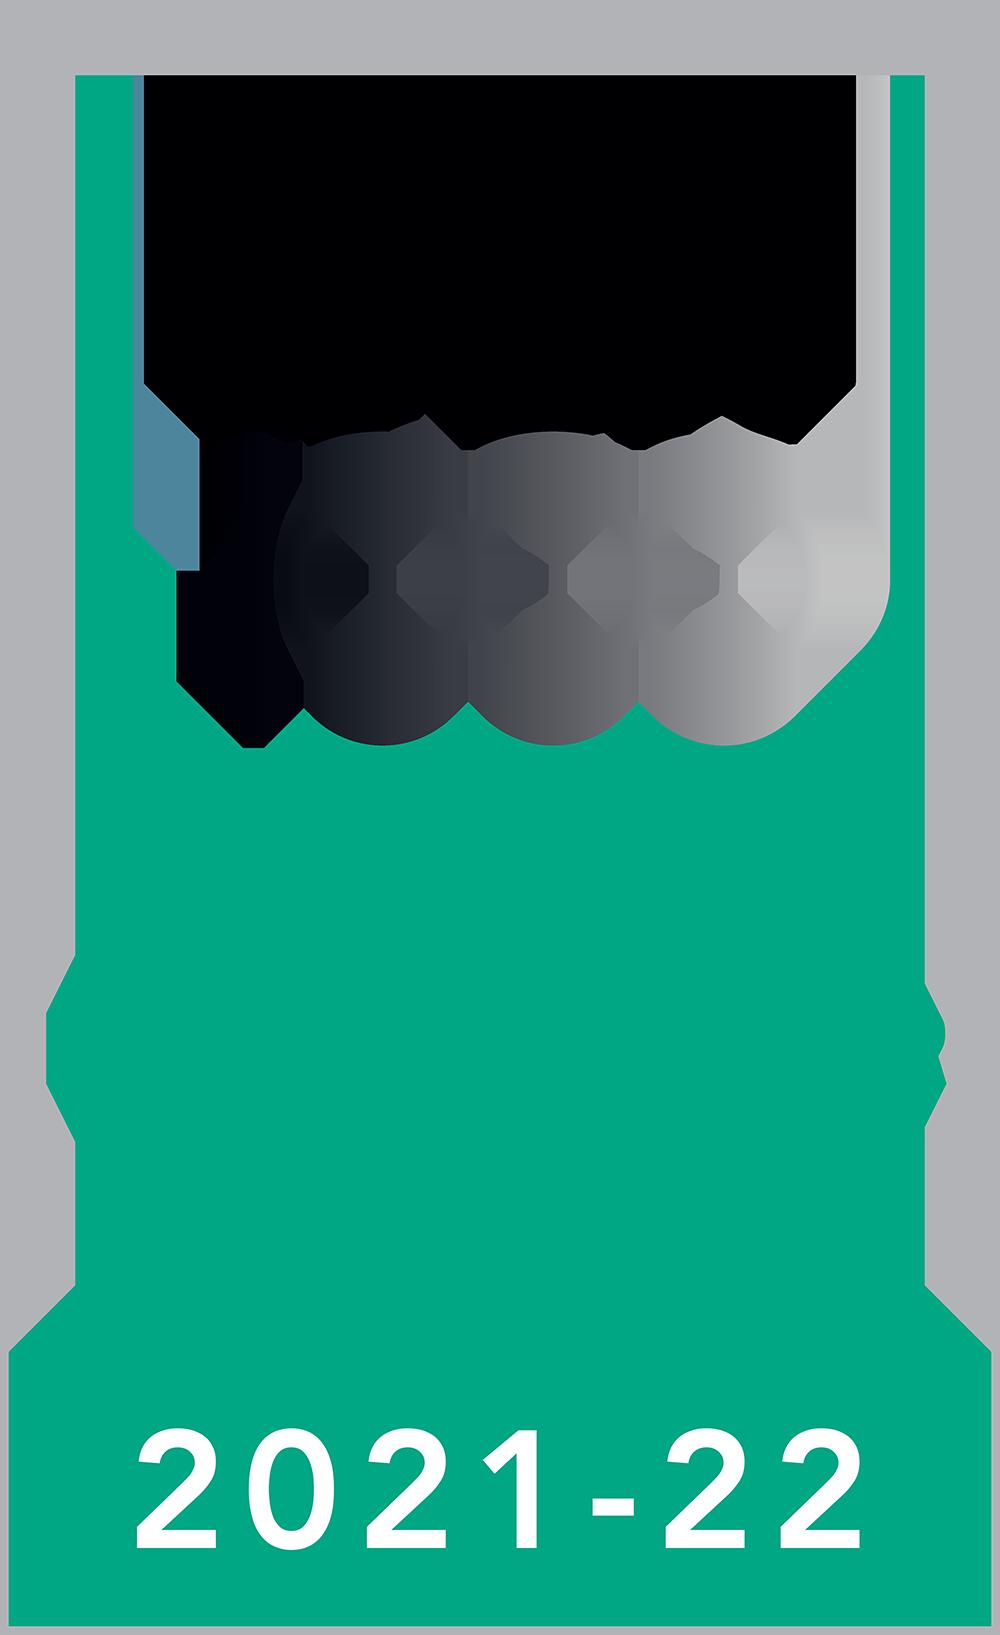 IFLR Notable Practitioner 2021-22